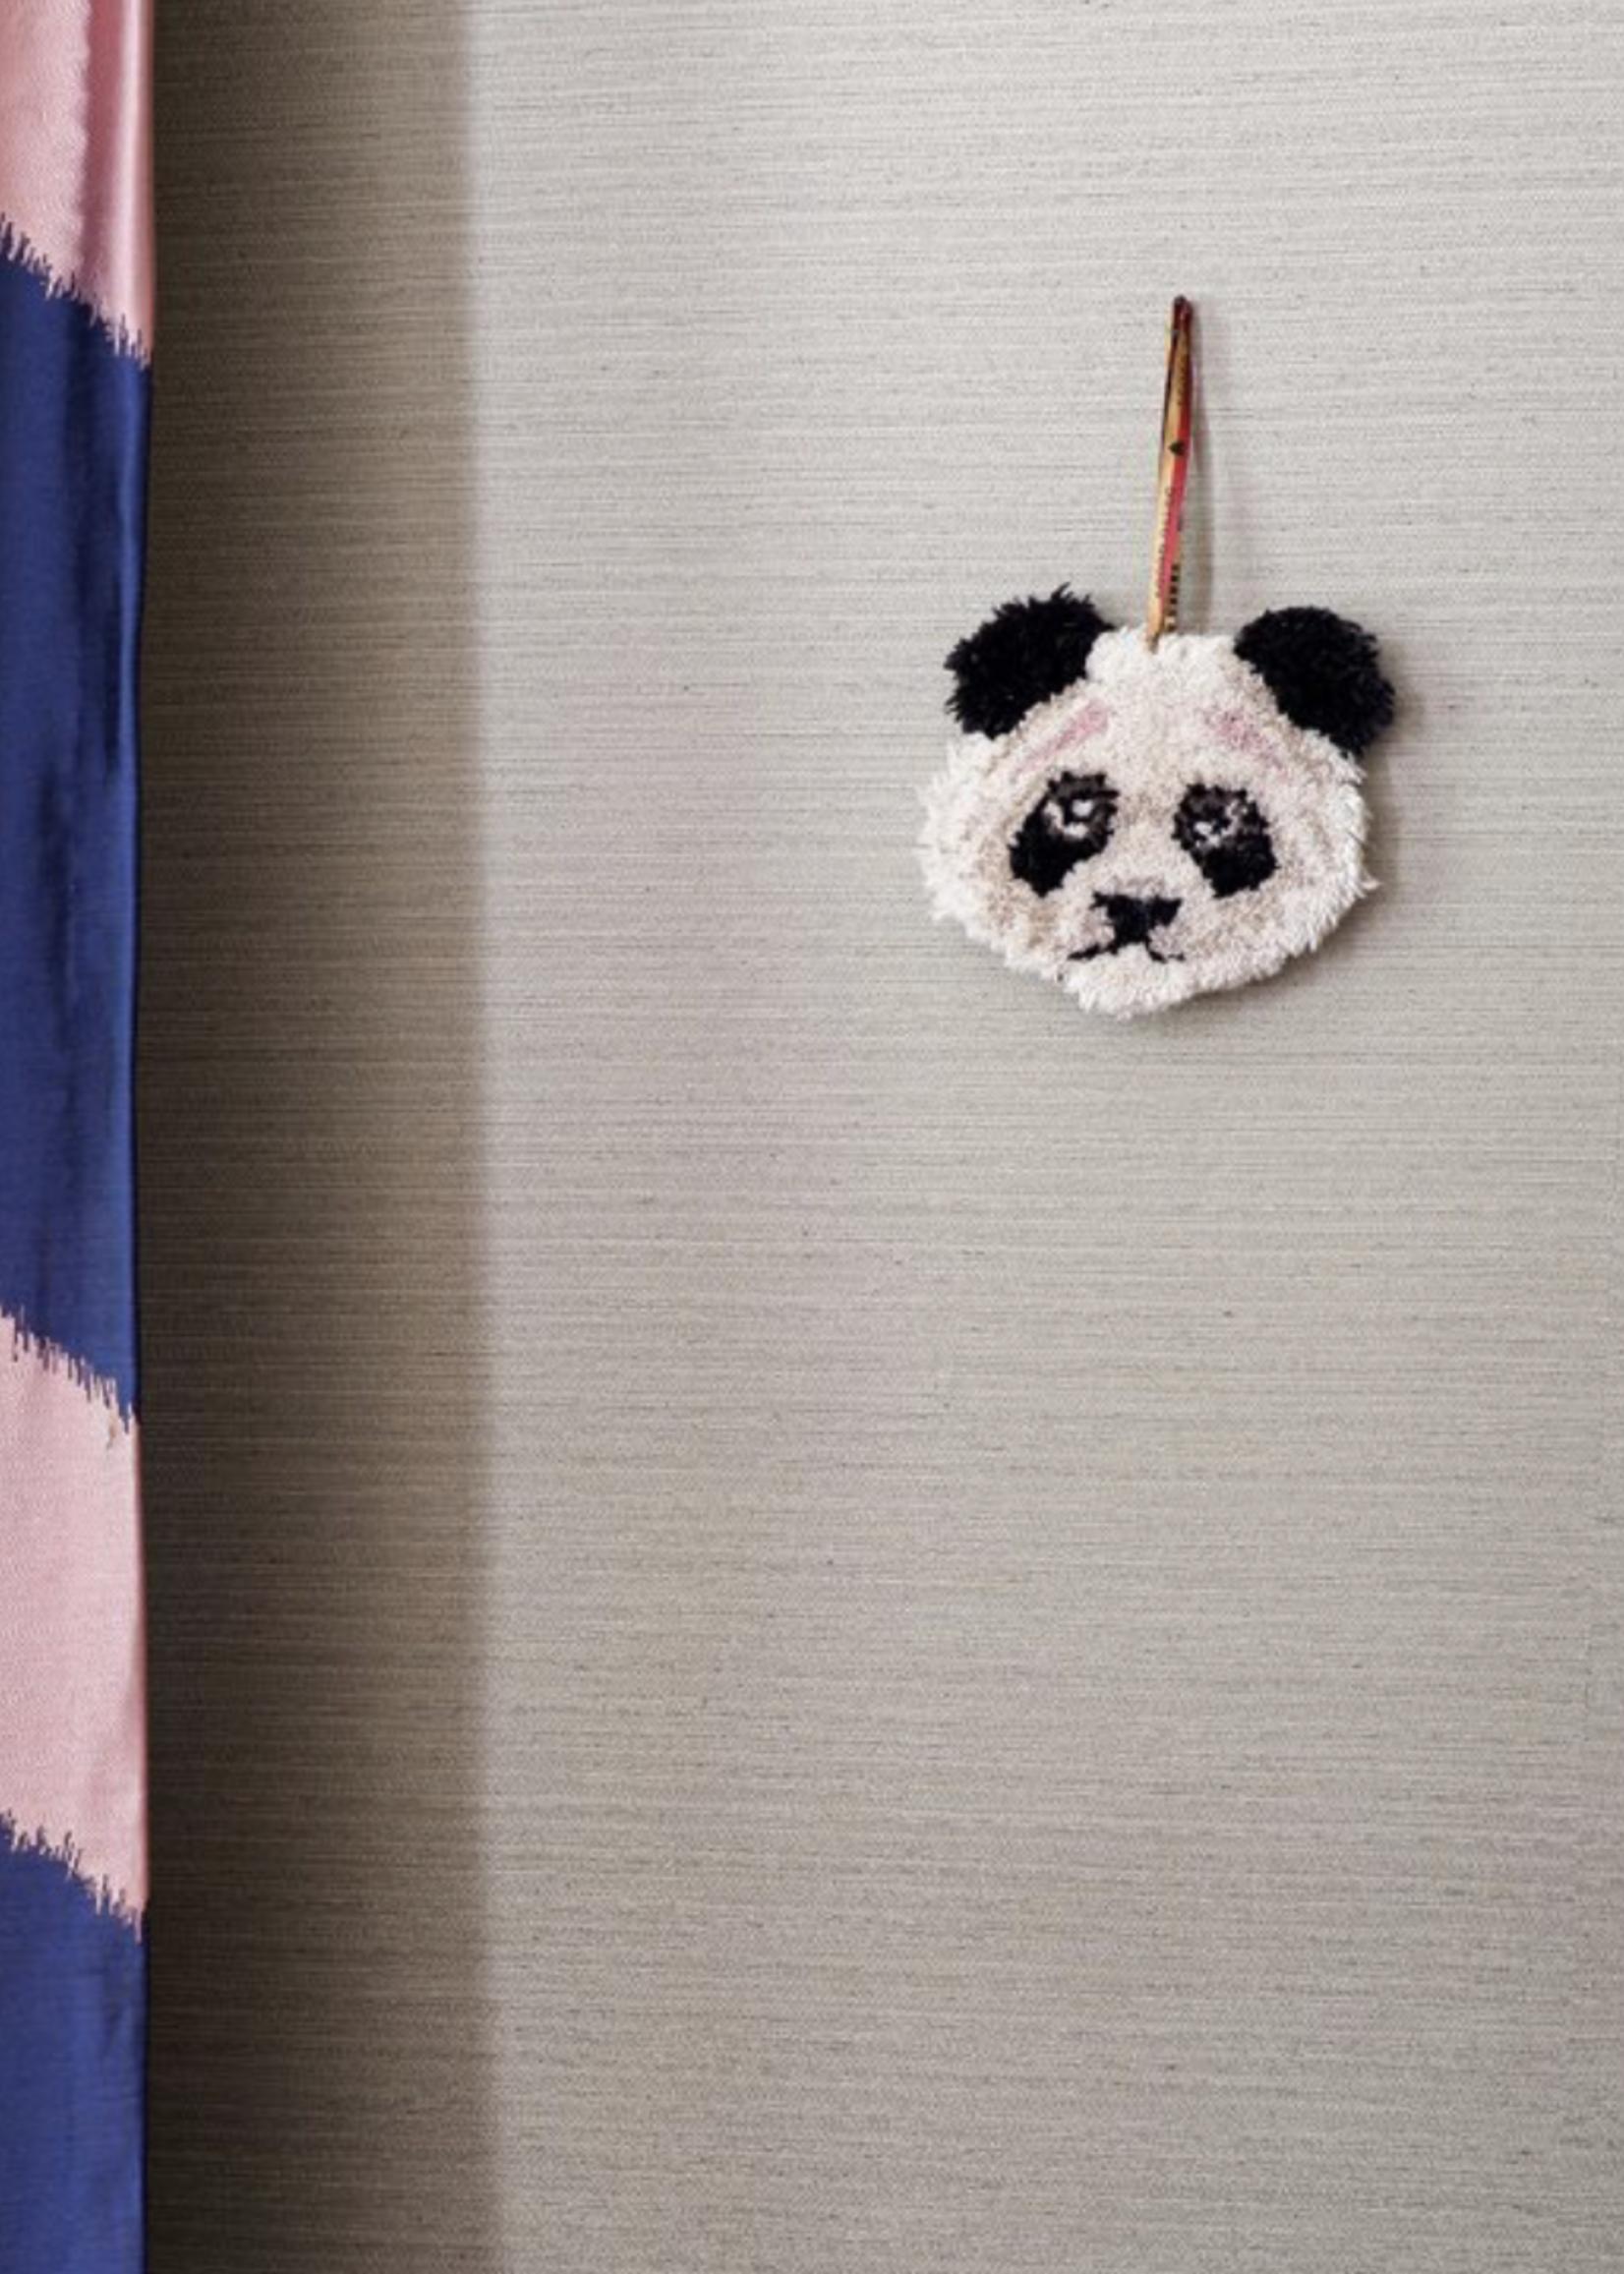 Doing Goods Plumpy Panda gift Hanger